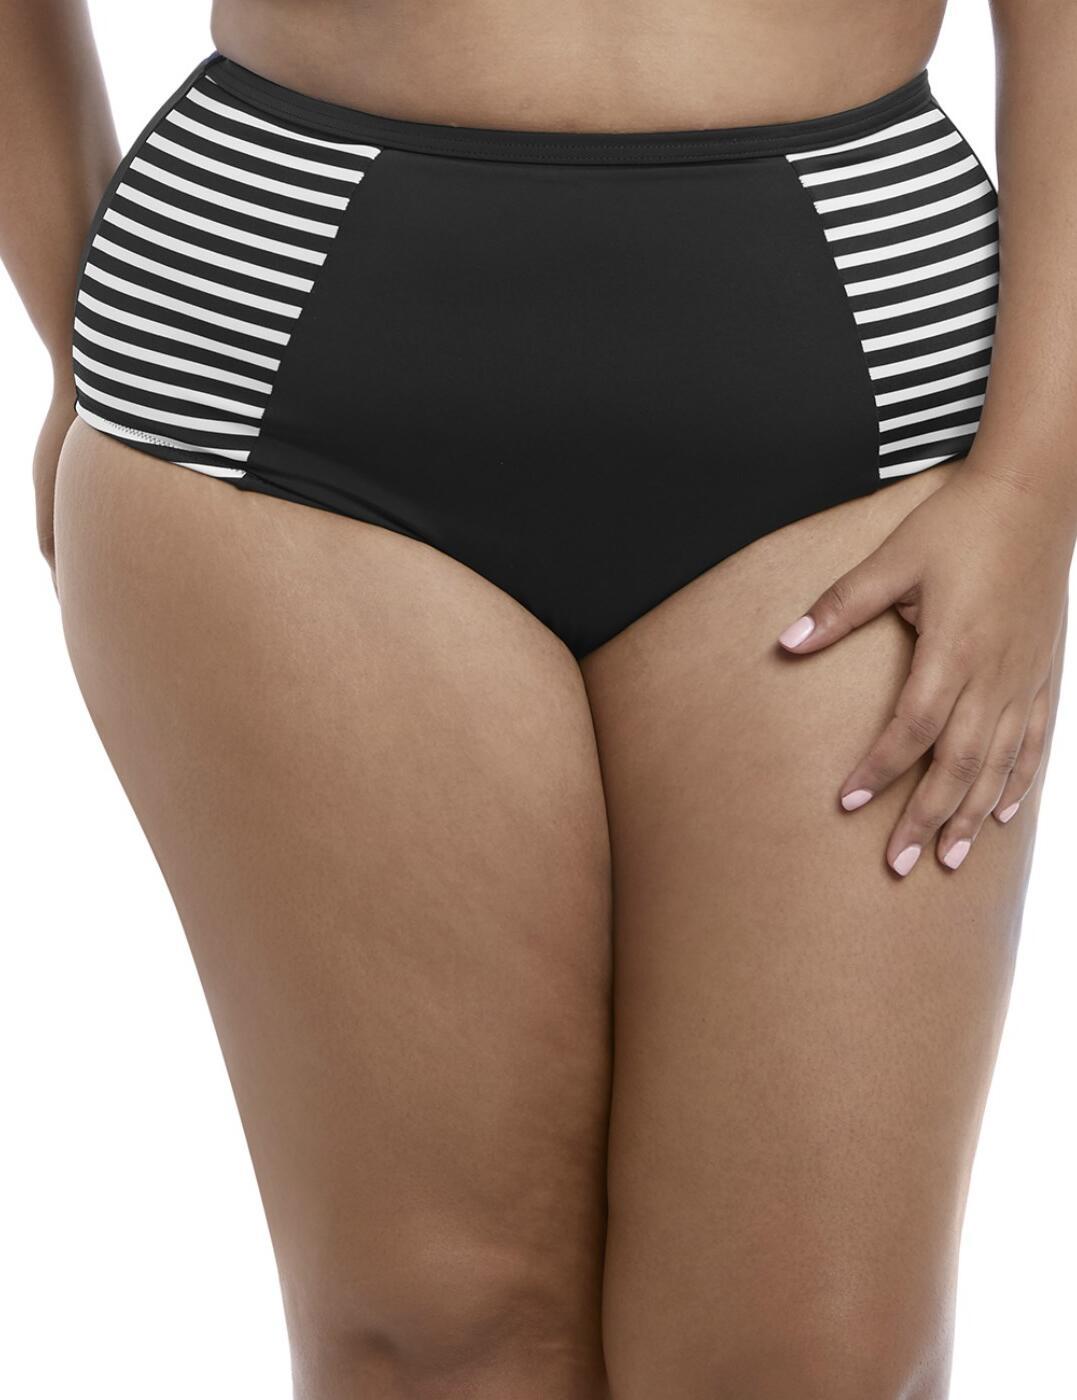 7635 Elomi Malibu Days Classic Bikini Brief - 7635 Black